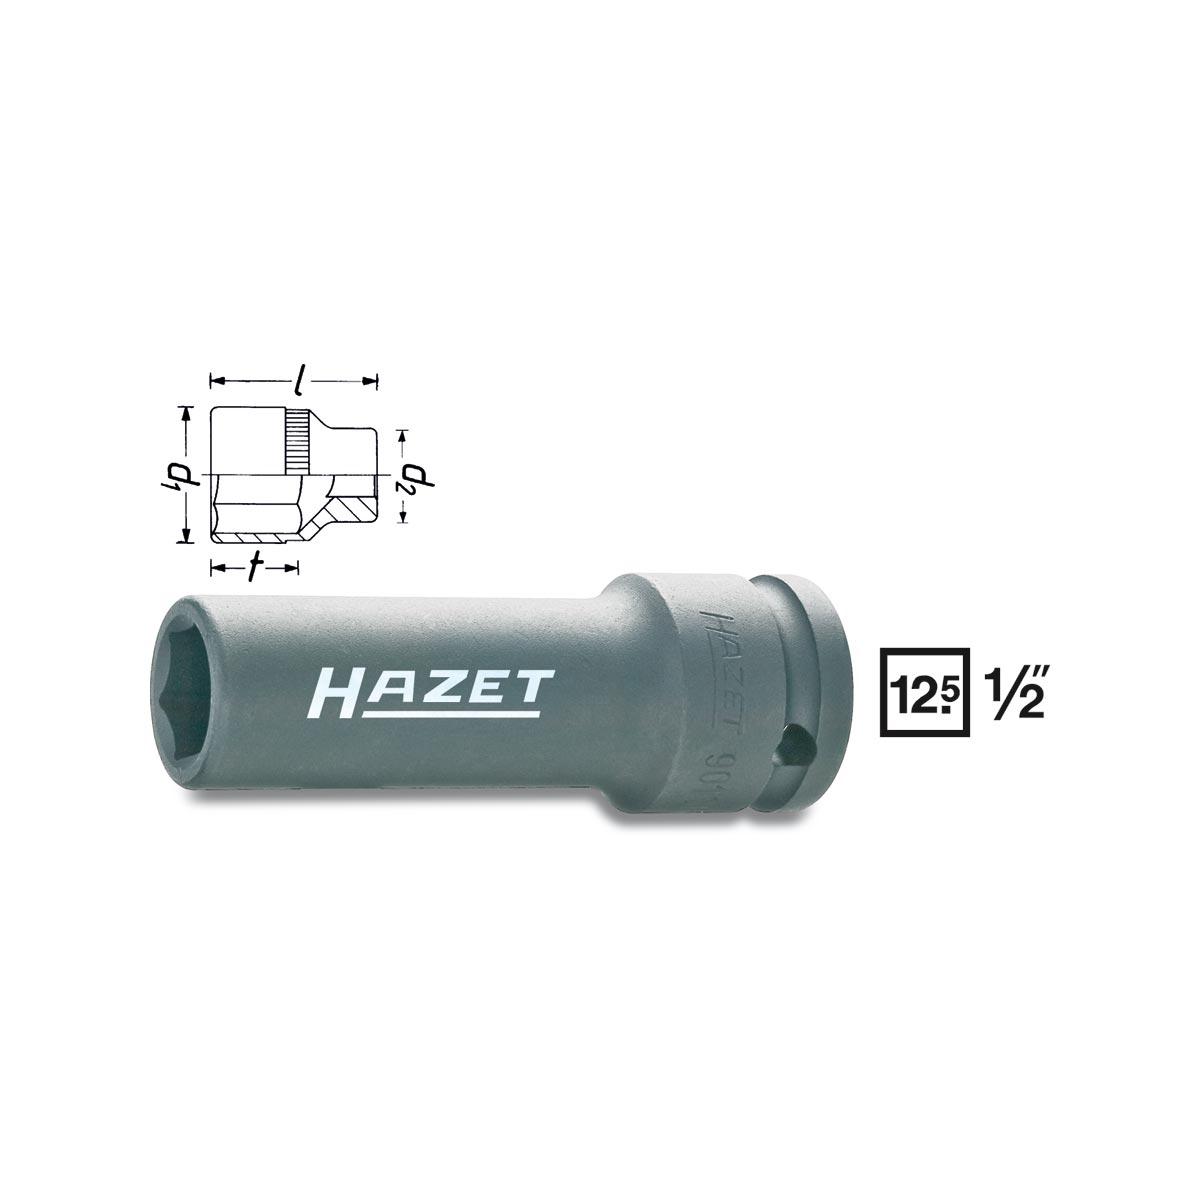 HAZET Impact 6point socket 901SLg, size 17 - 21 mm